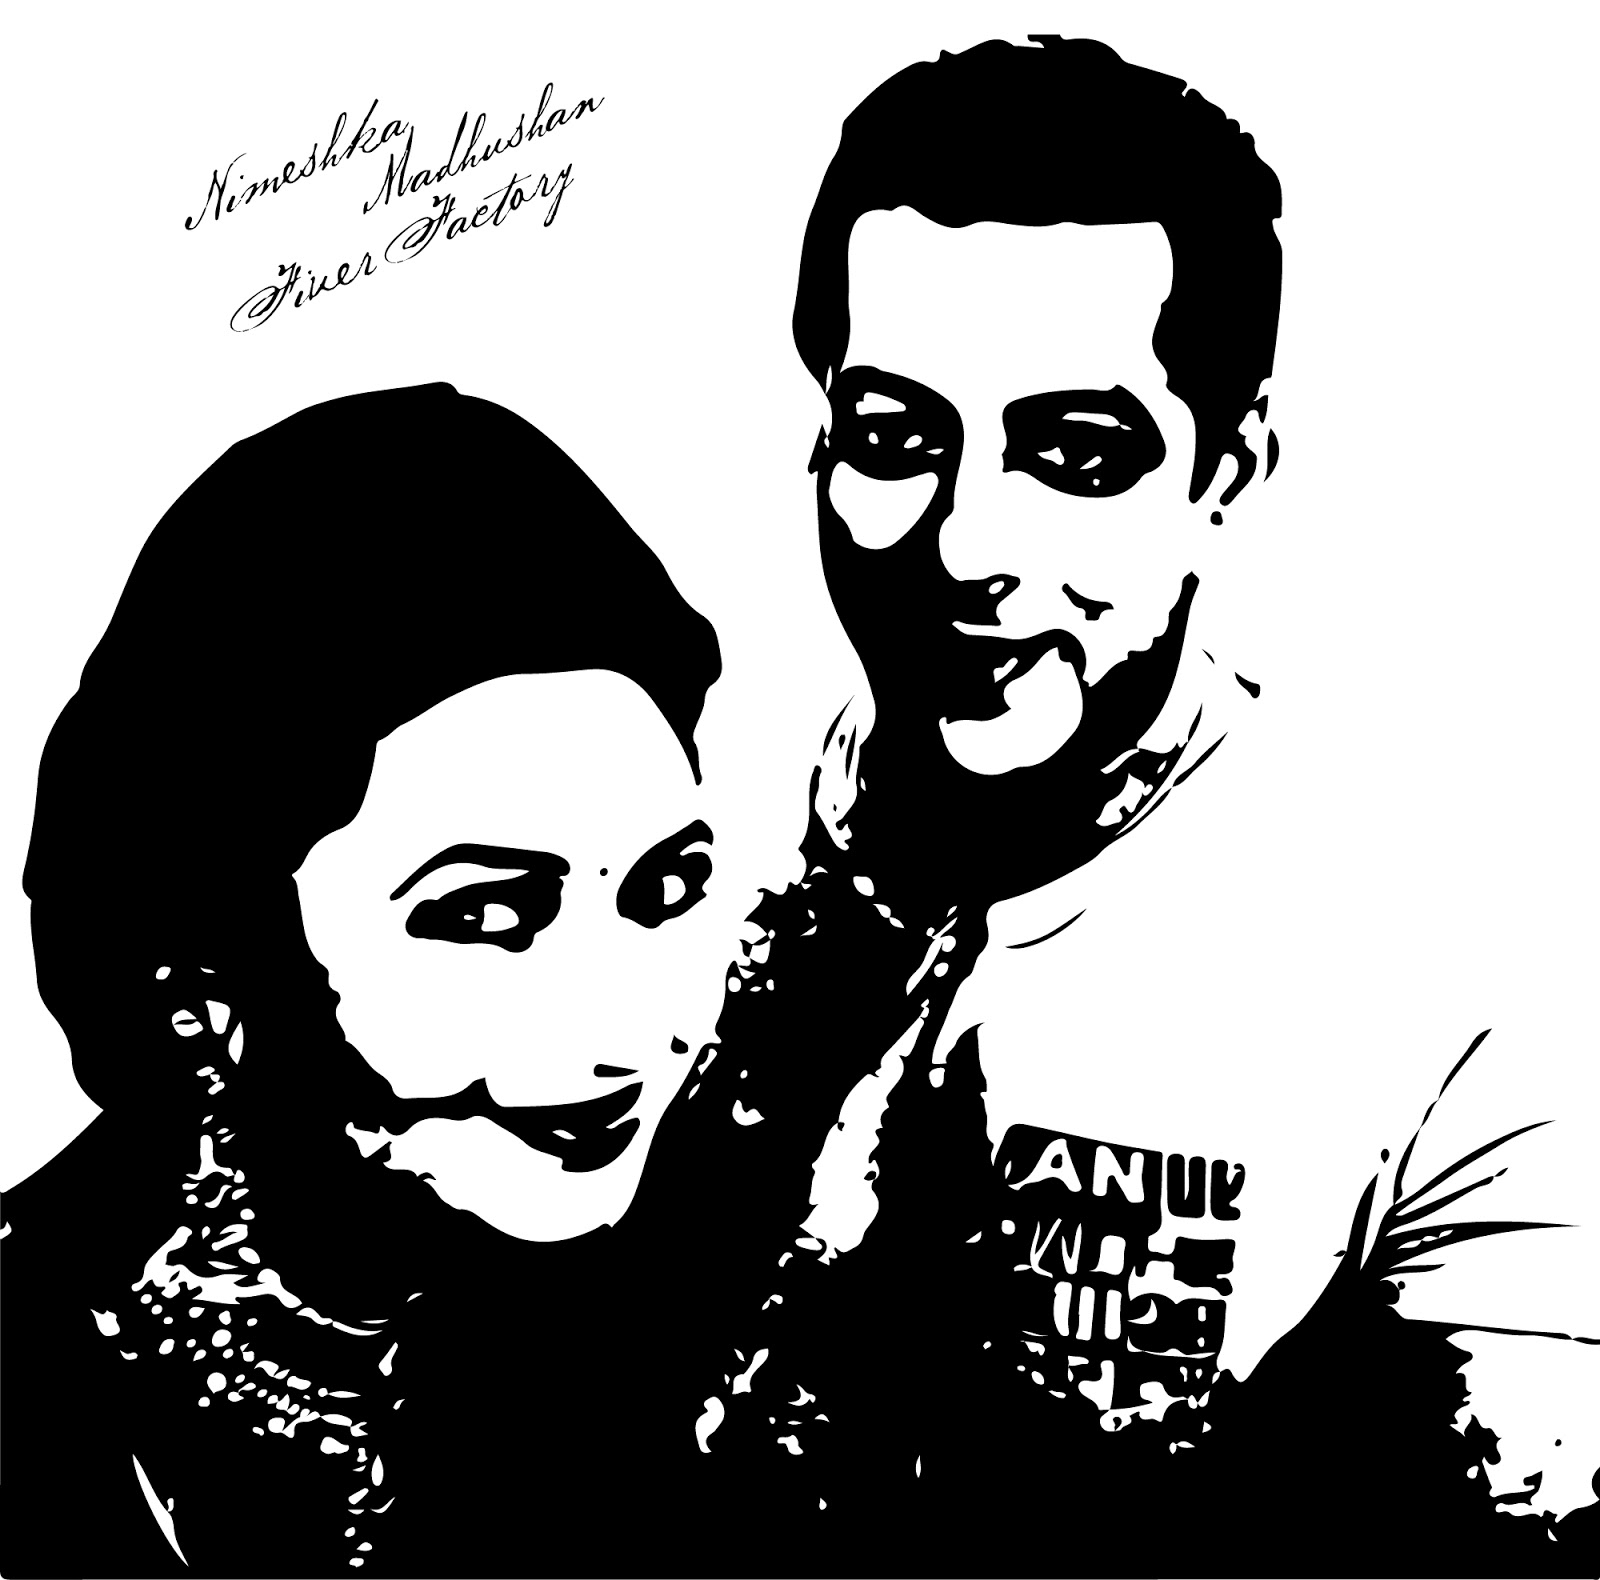 shahrukh khan coloring pages | Divyanka Tripathi and Salman Khan Selfie Vector Image ...